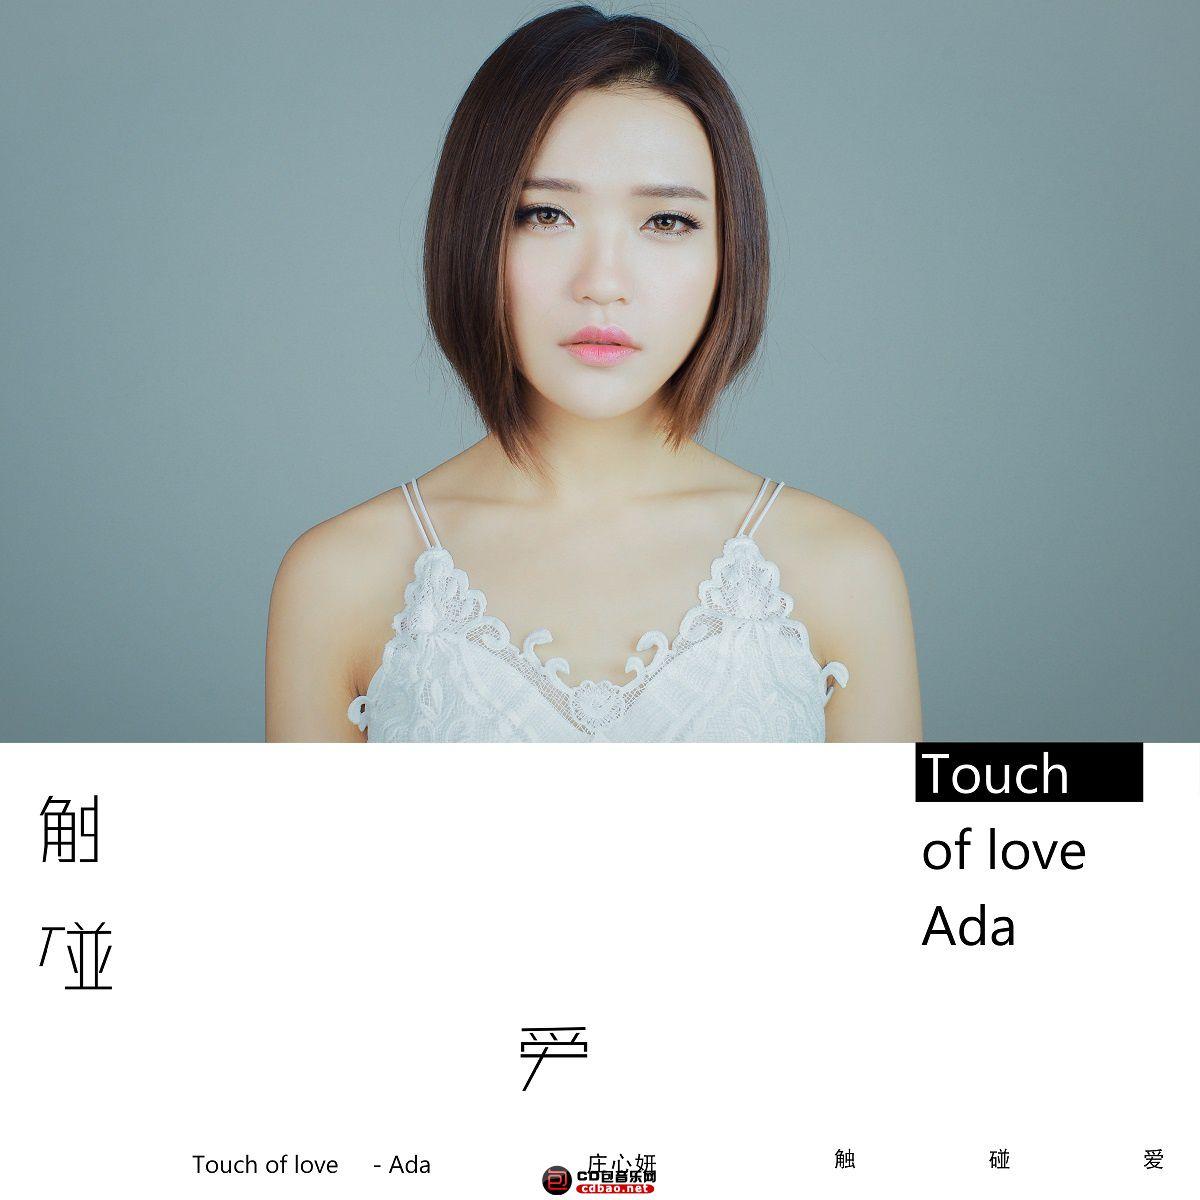 庄心妍-Touch Of Love.jpg